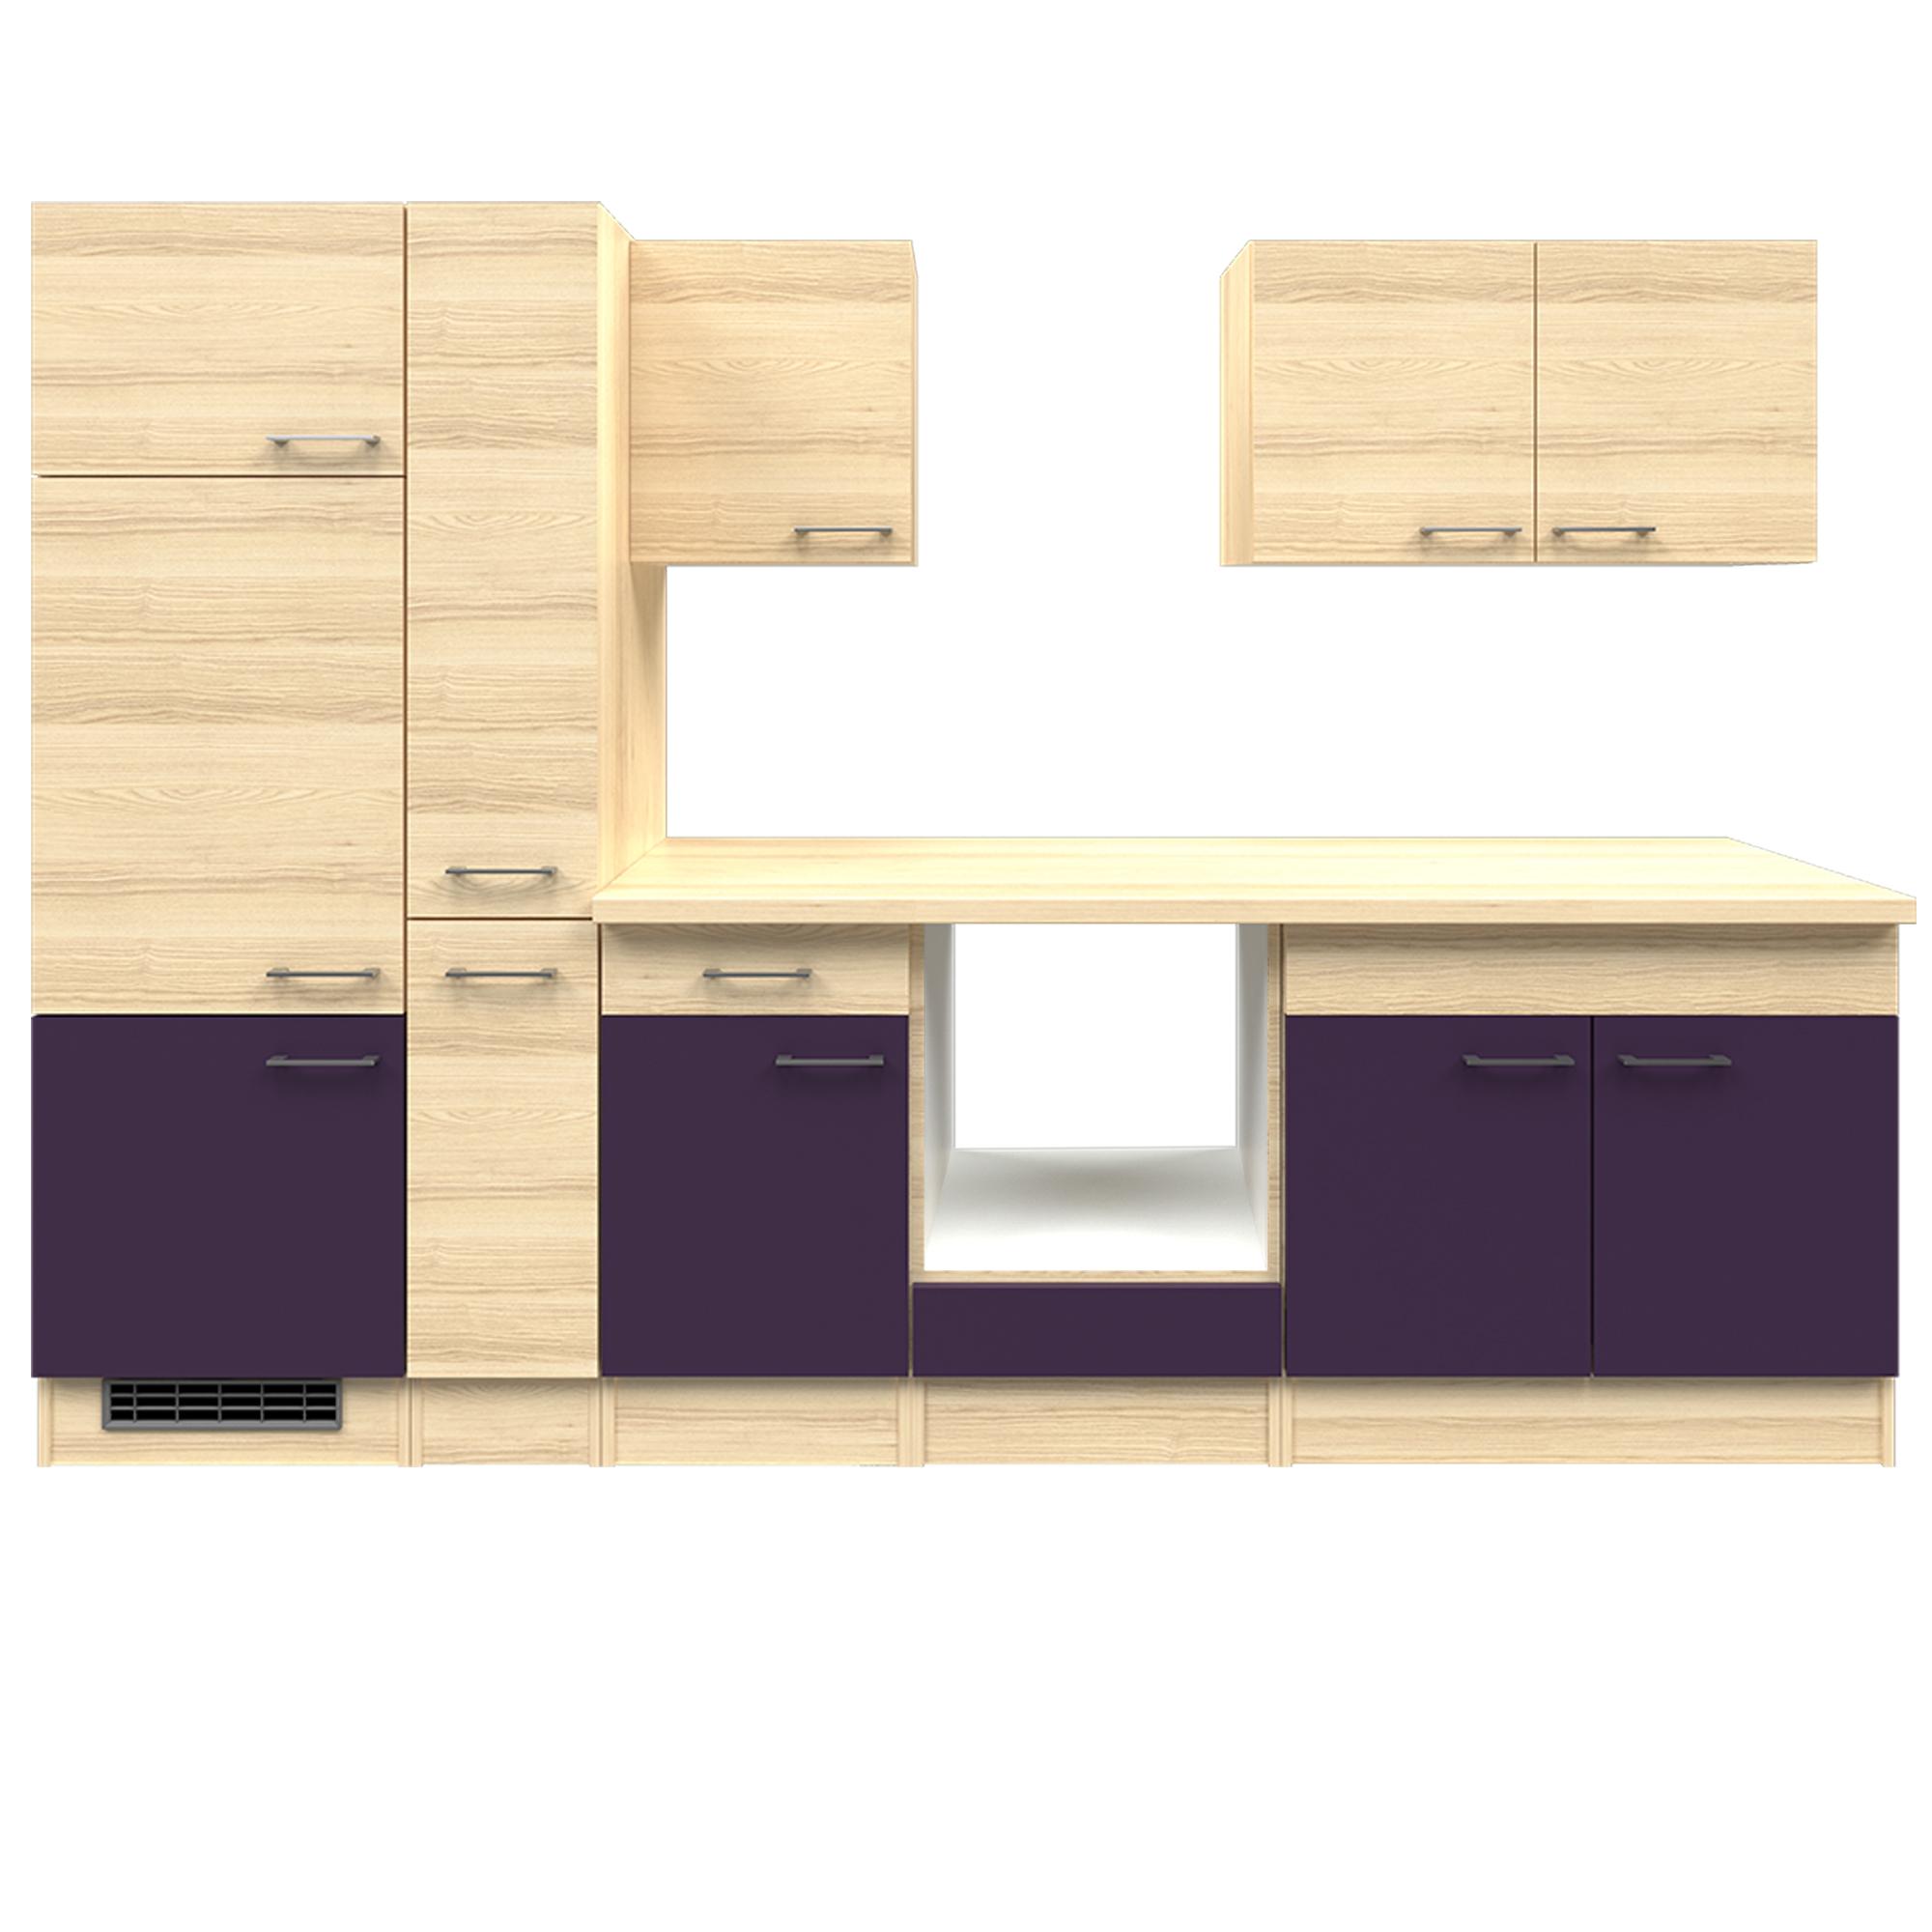 k che ohne ger te k chenzeile k chenblock einbauk che apothekerschrank 300 cm ebay. Black Bedroom Furniture Sets. Home Design Ideas